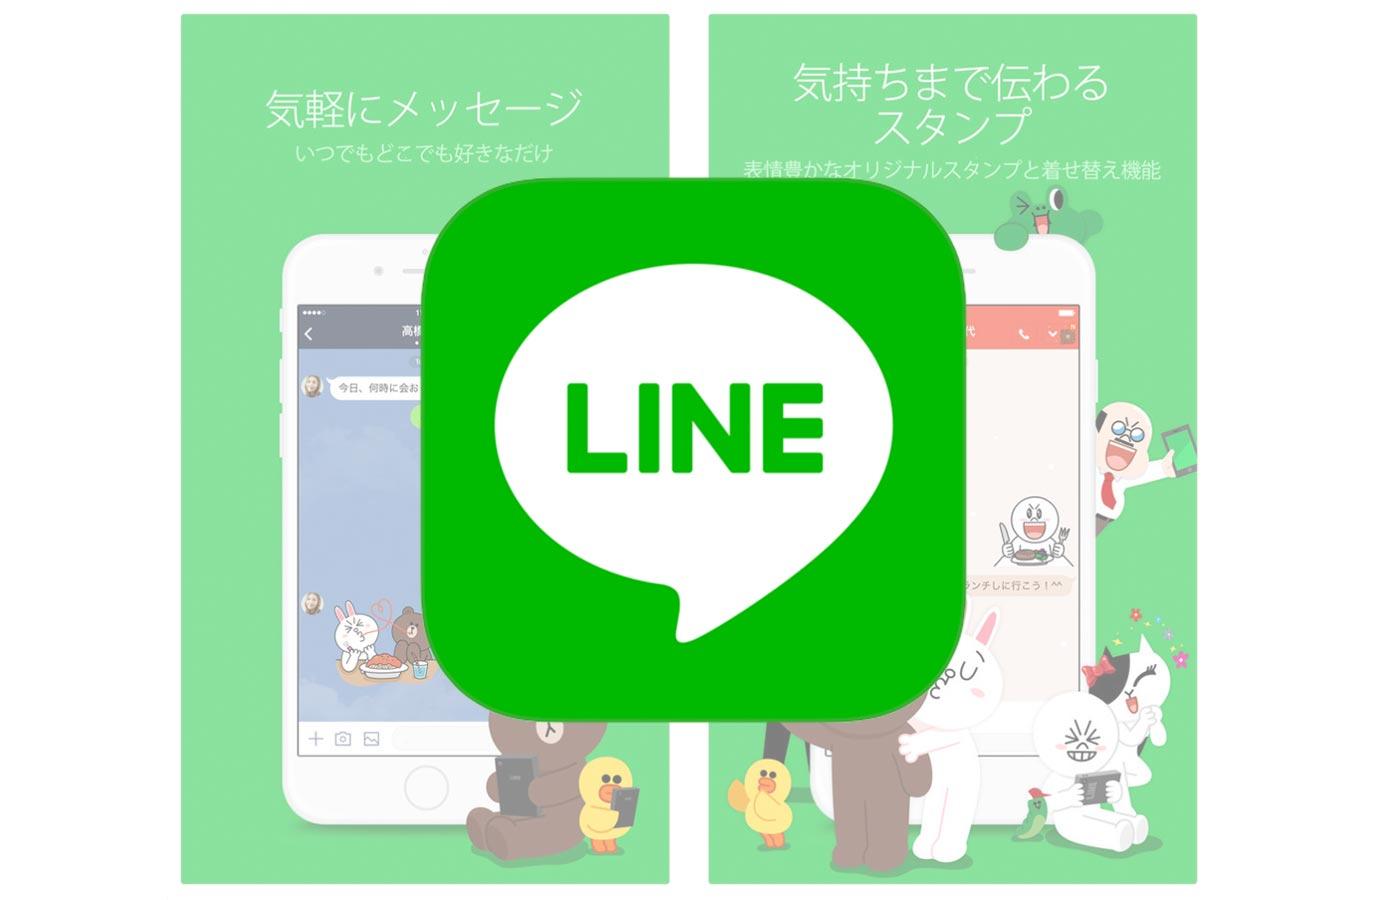 iOSアプリ「LINE」がアップデートで、写真・動画が簡単に送れるようにトークルームの中にあるキーボードデザインをリニューアル